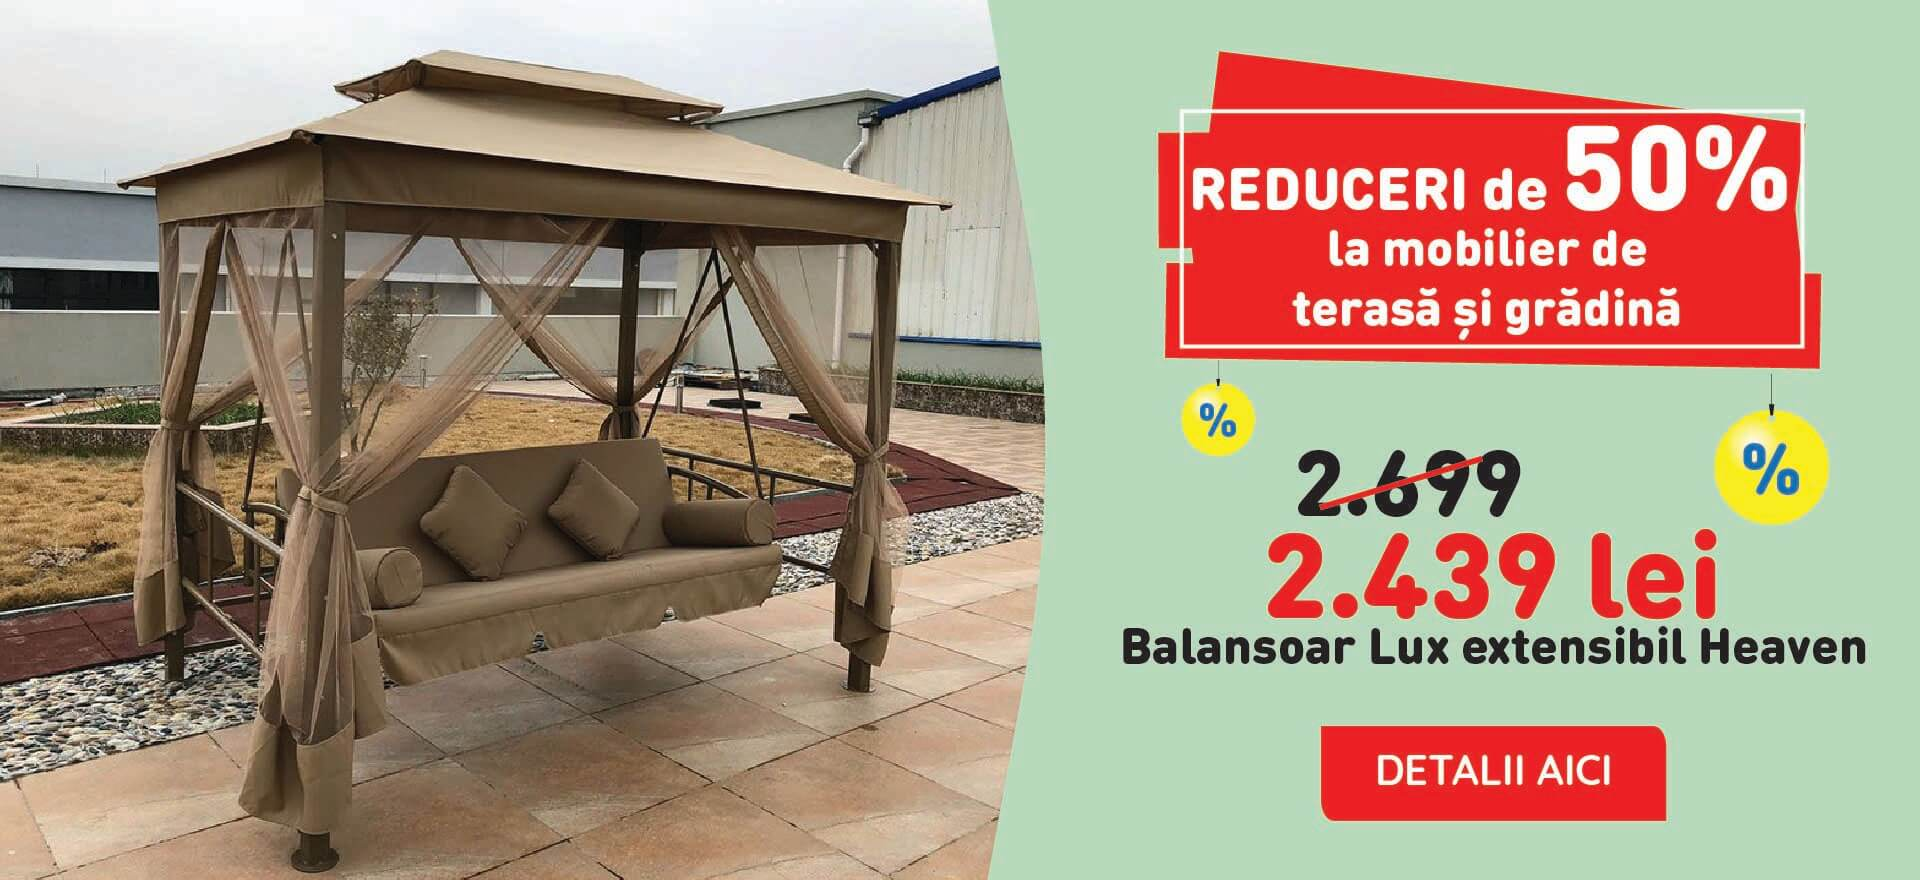 Reducere Balansoar Lux extensibil Heaven